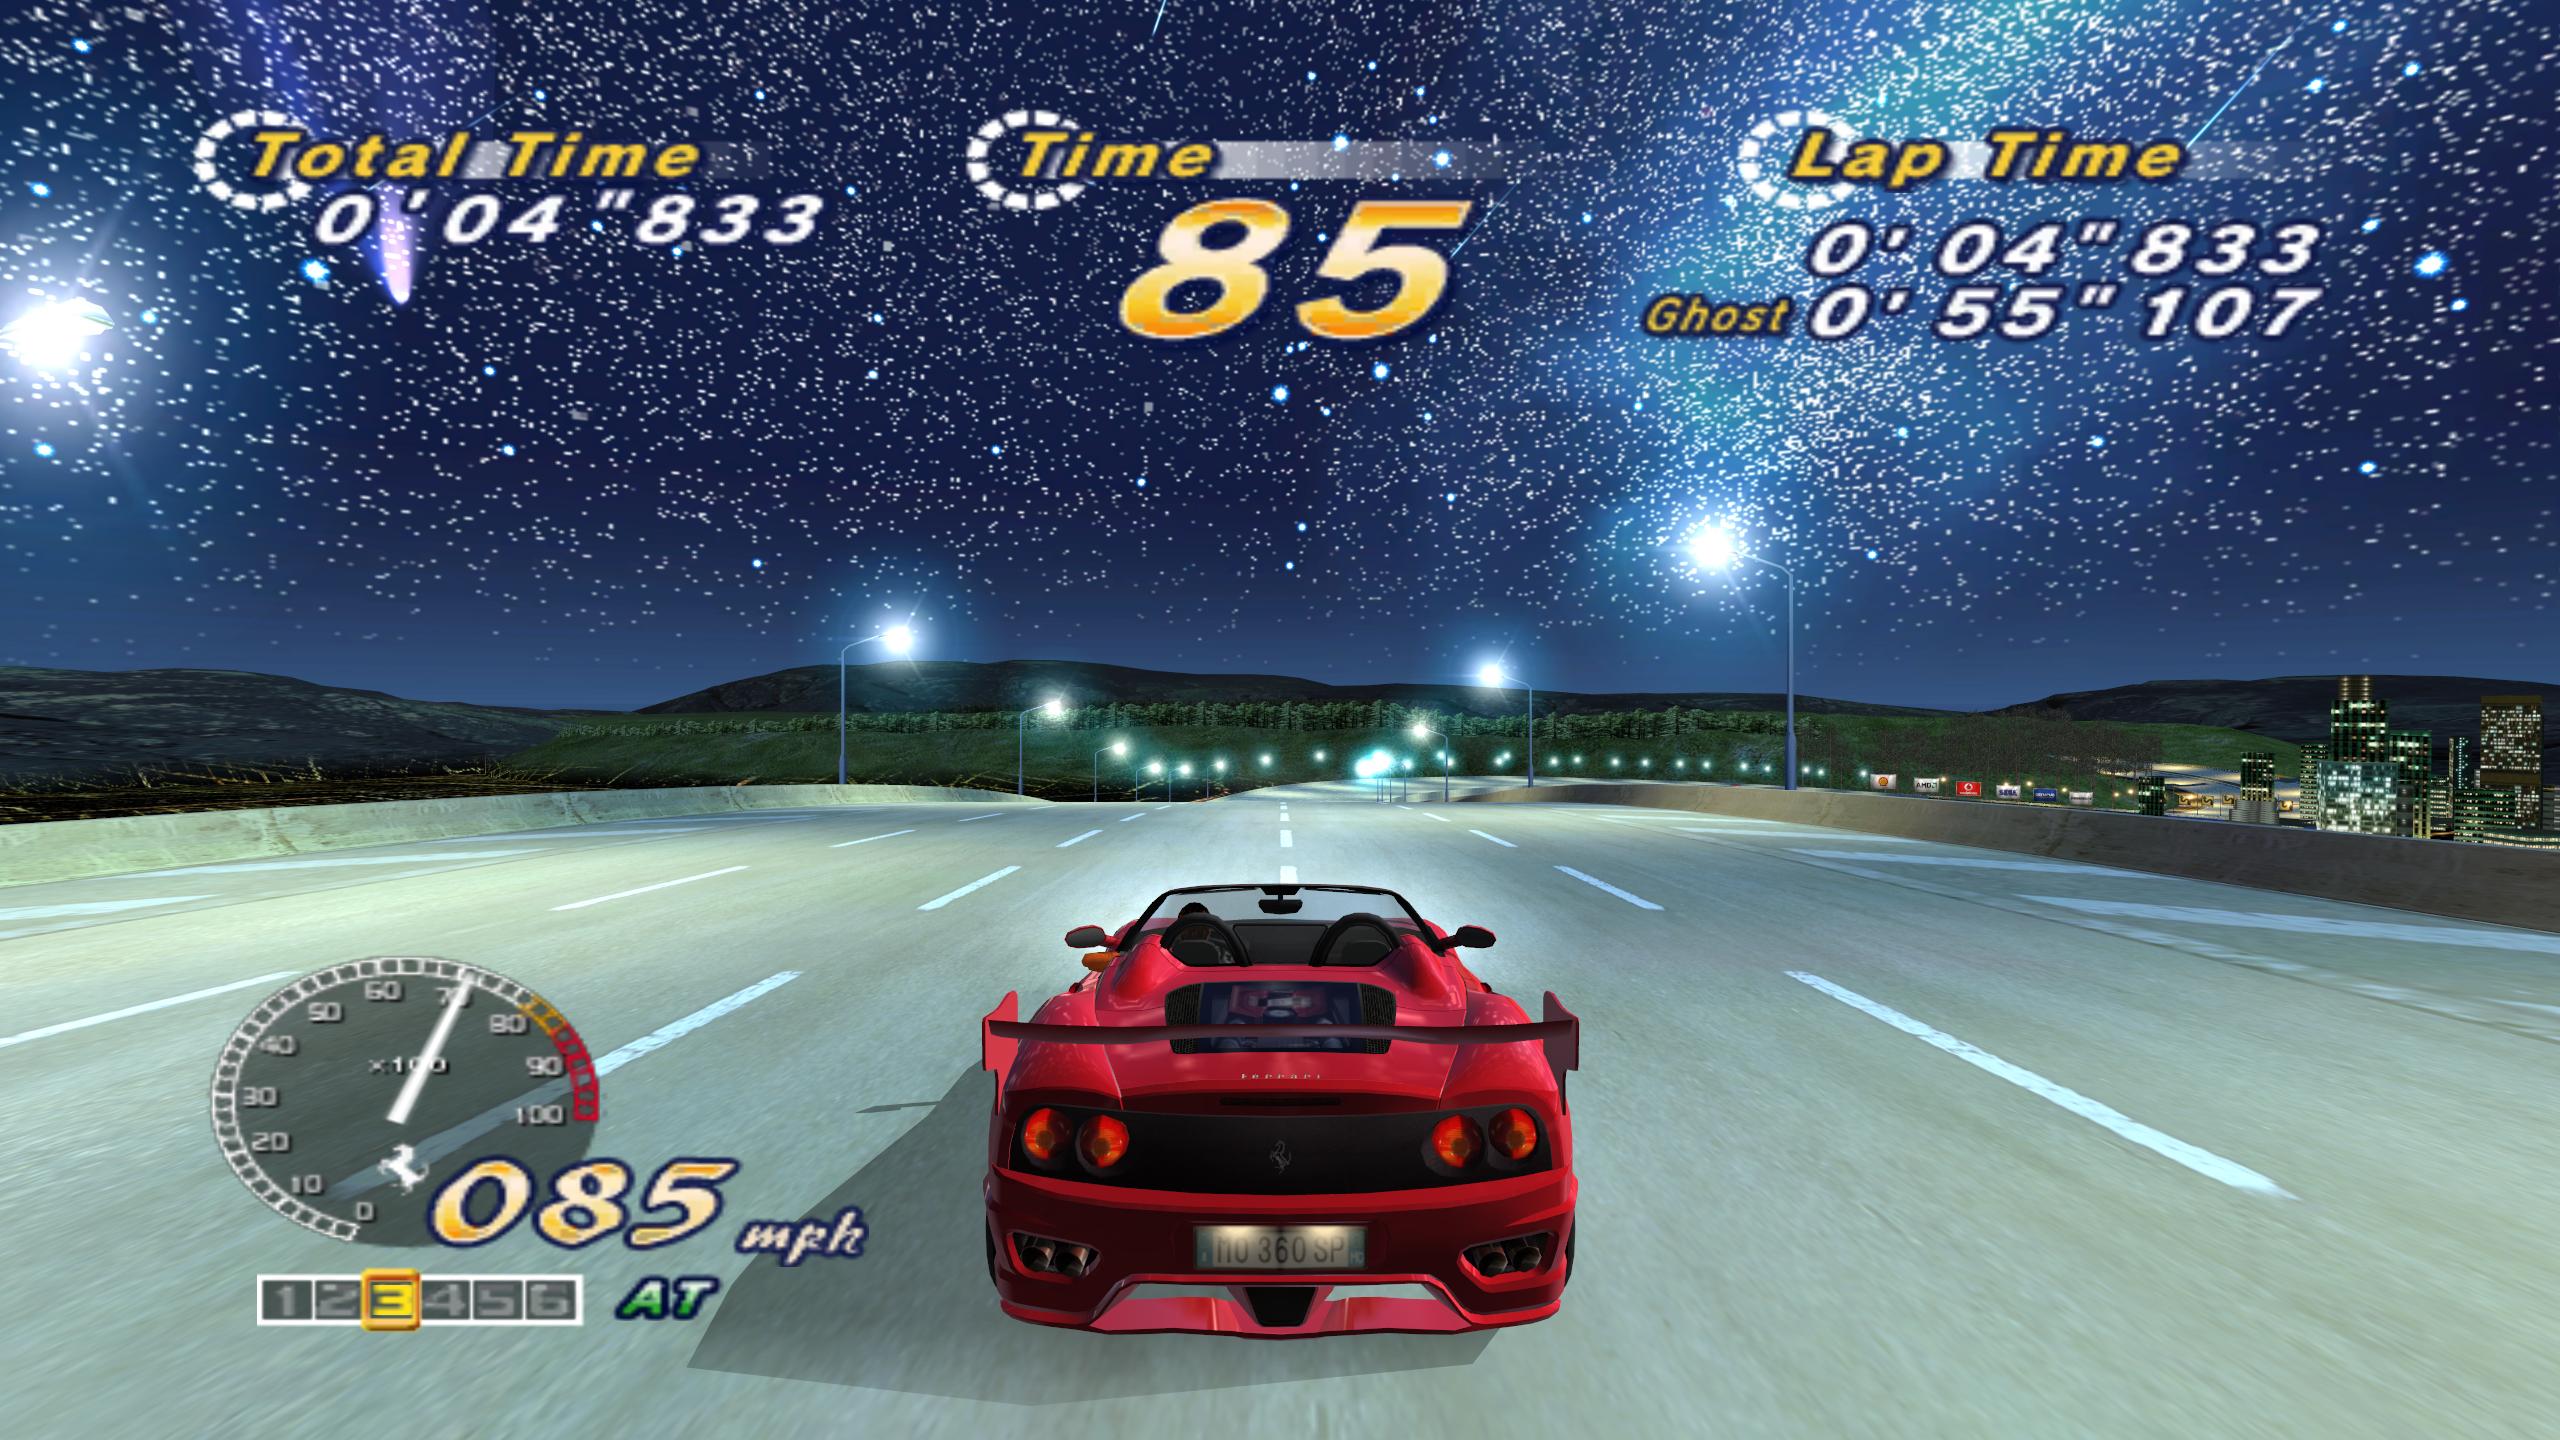 Ferrari driving on a road at night